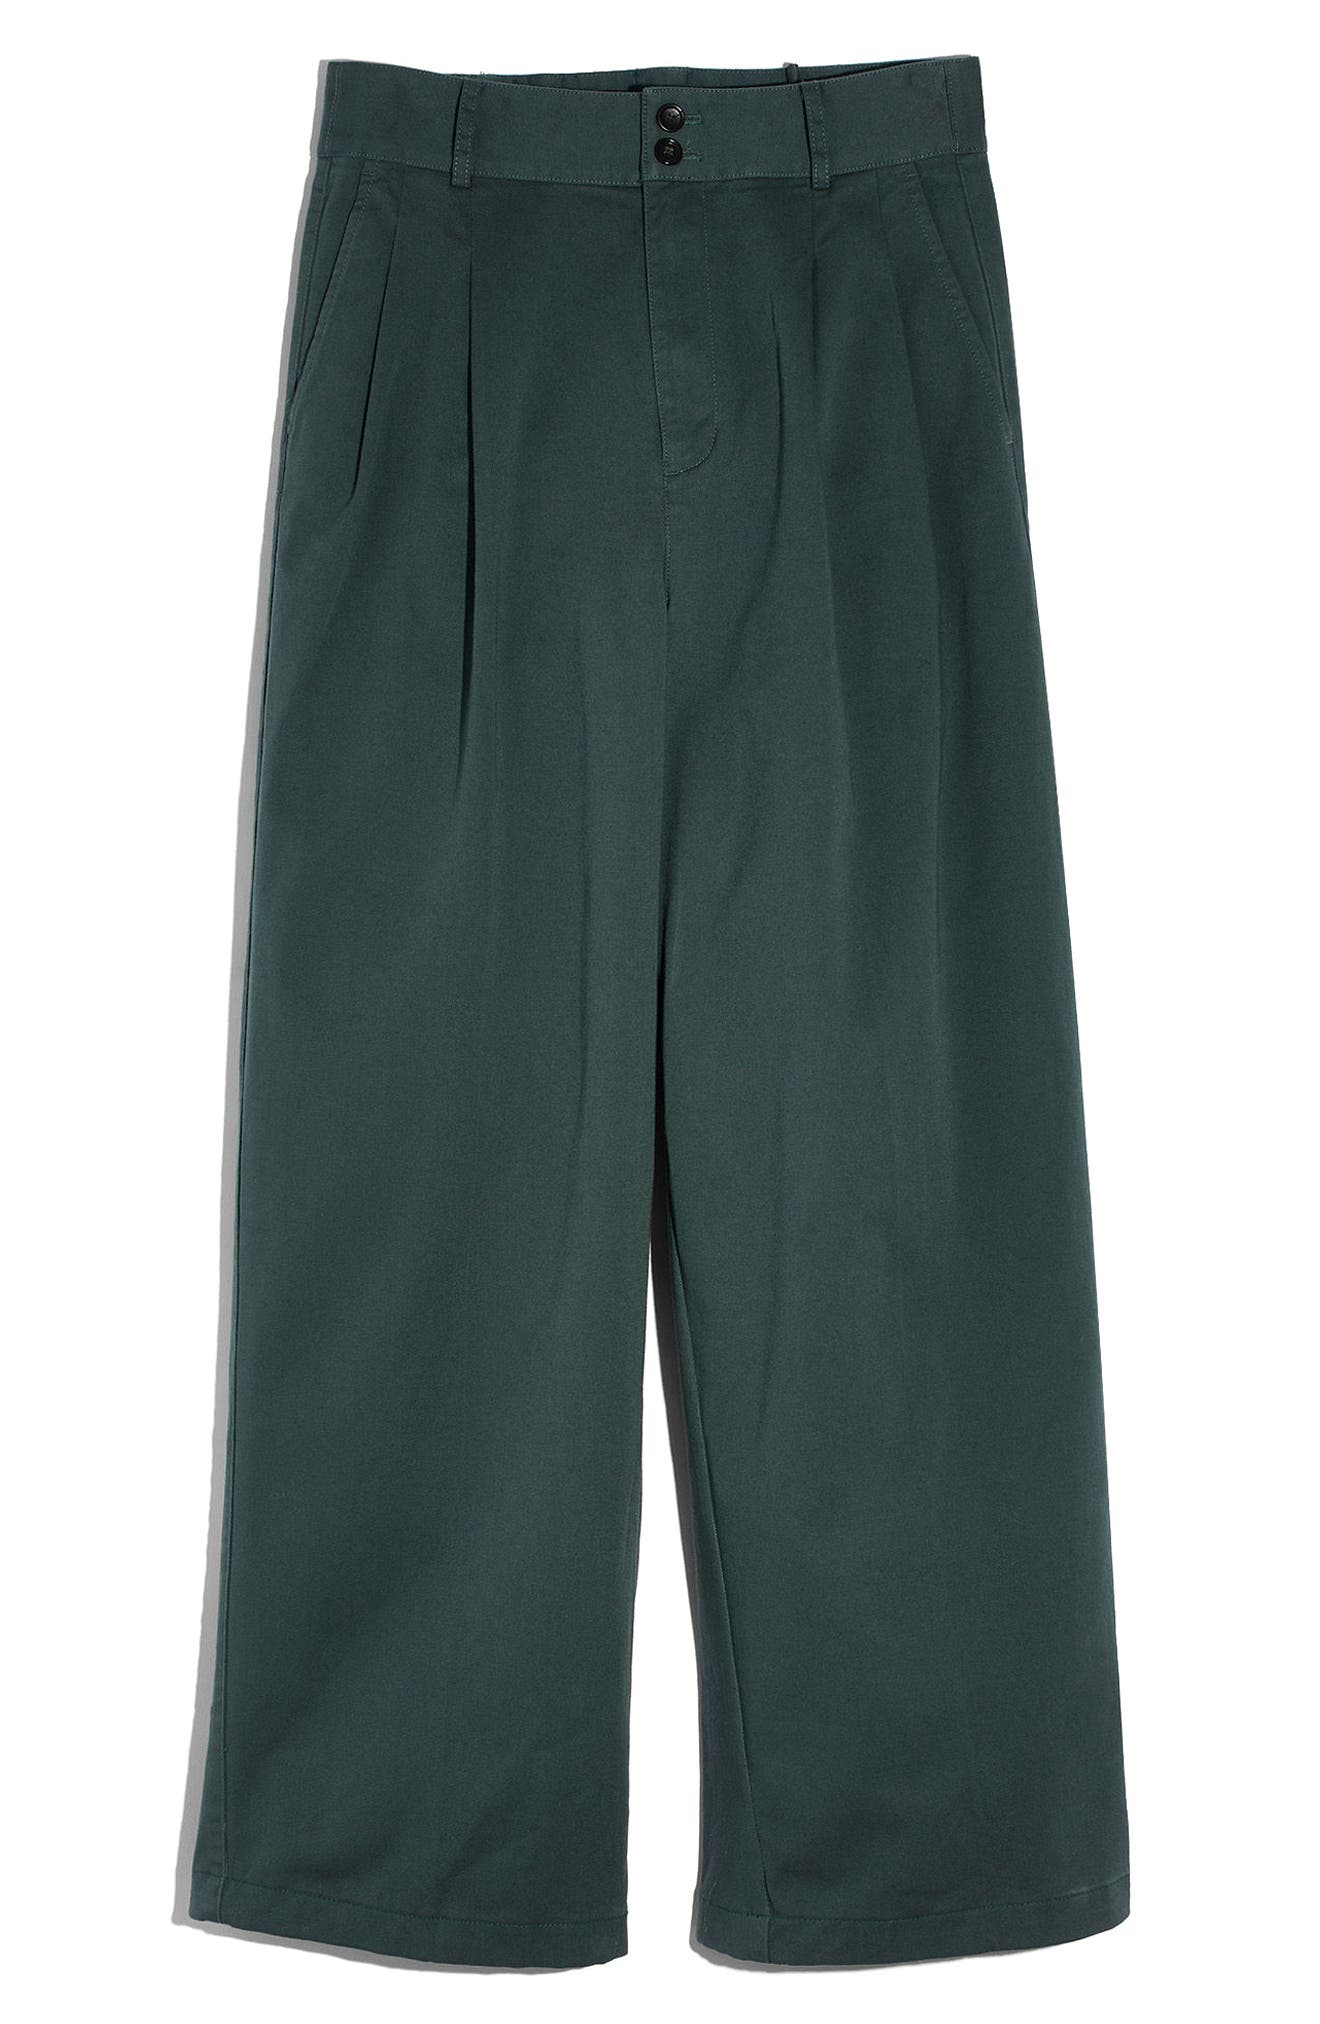 High Waist Crop Wide Leg Pants,                             Alternate thumbnail 4, color,                             Architect Green